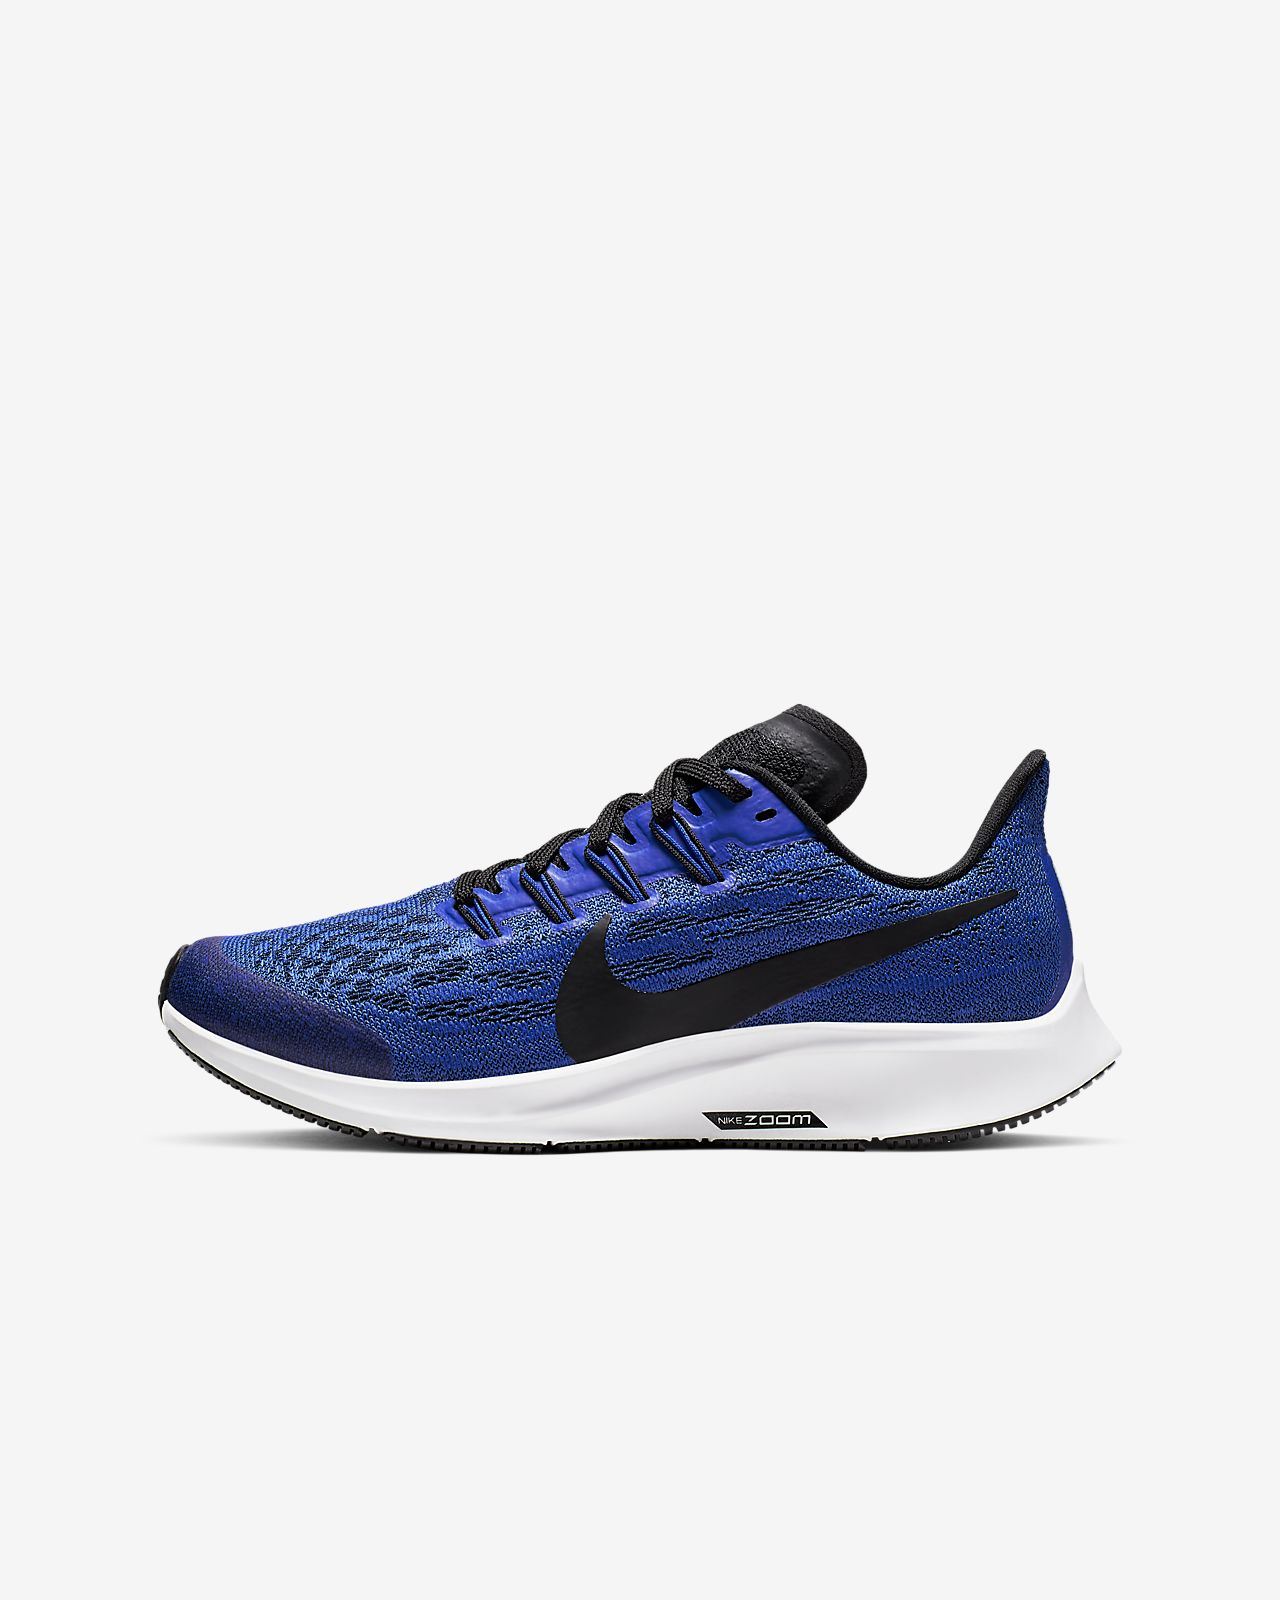 Löparsko Nike Air Zoom Pegasus 36 för barn/ungdom